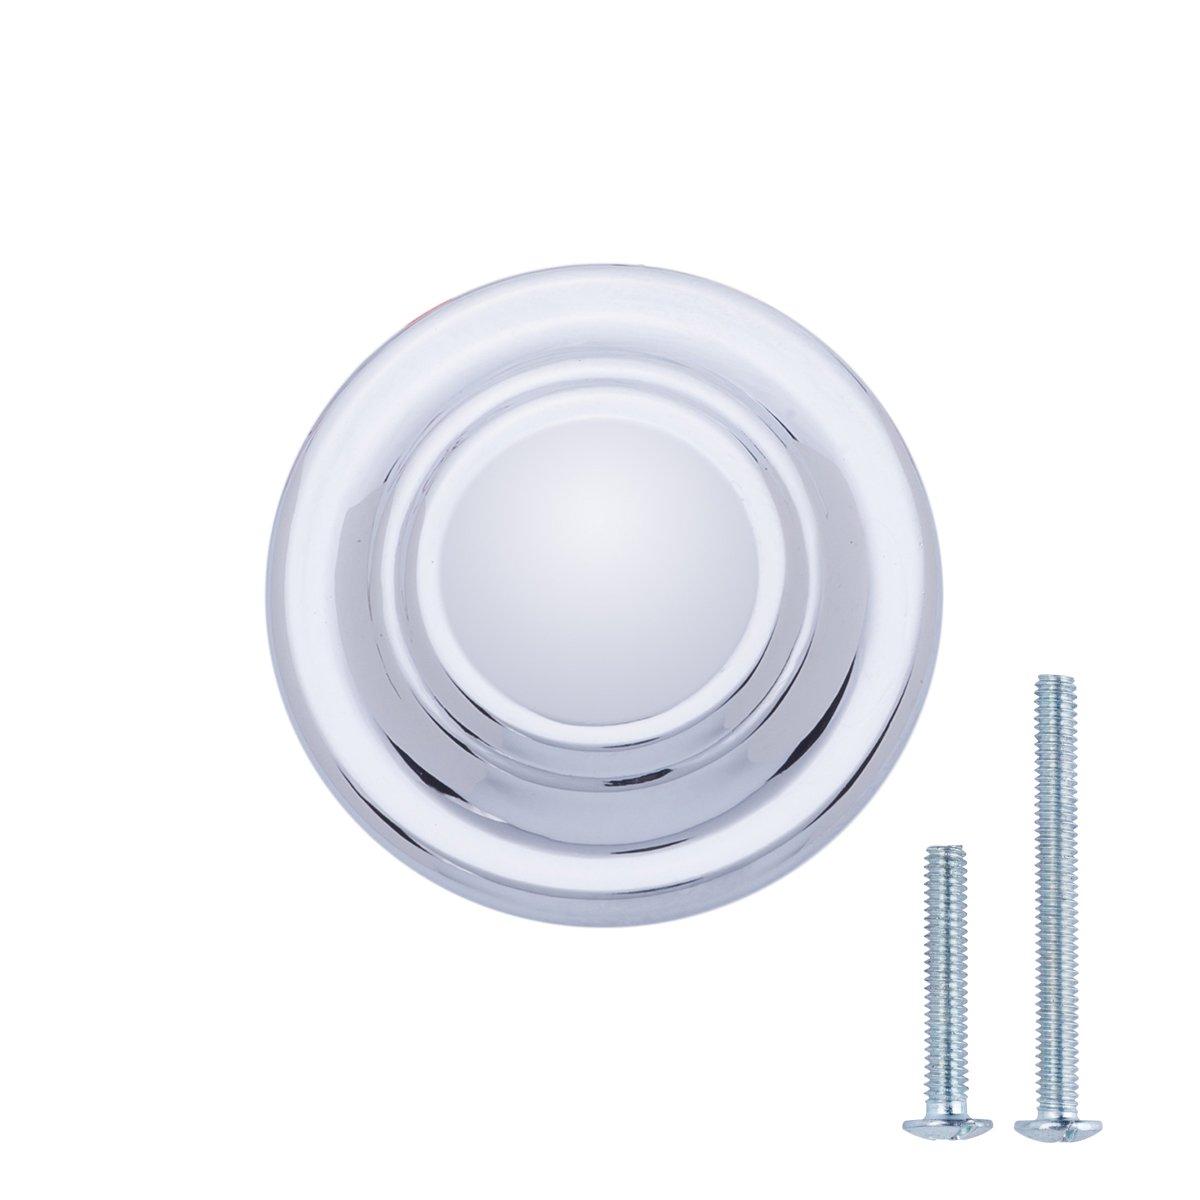 AmazonBasics Traditional Top Ring Cabinet Knob, 1.25'' Diameter, Polished Chrome, 25-Pack